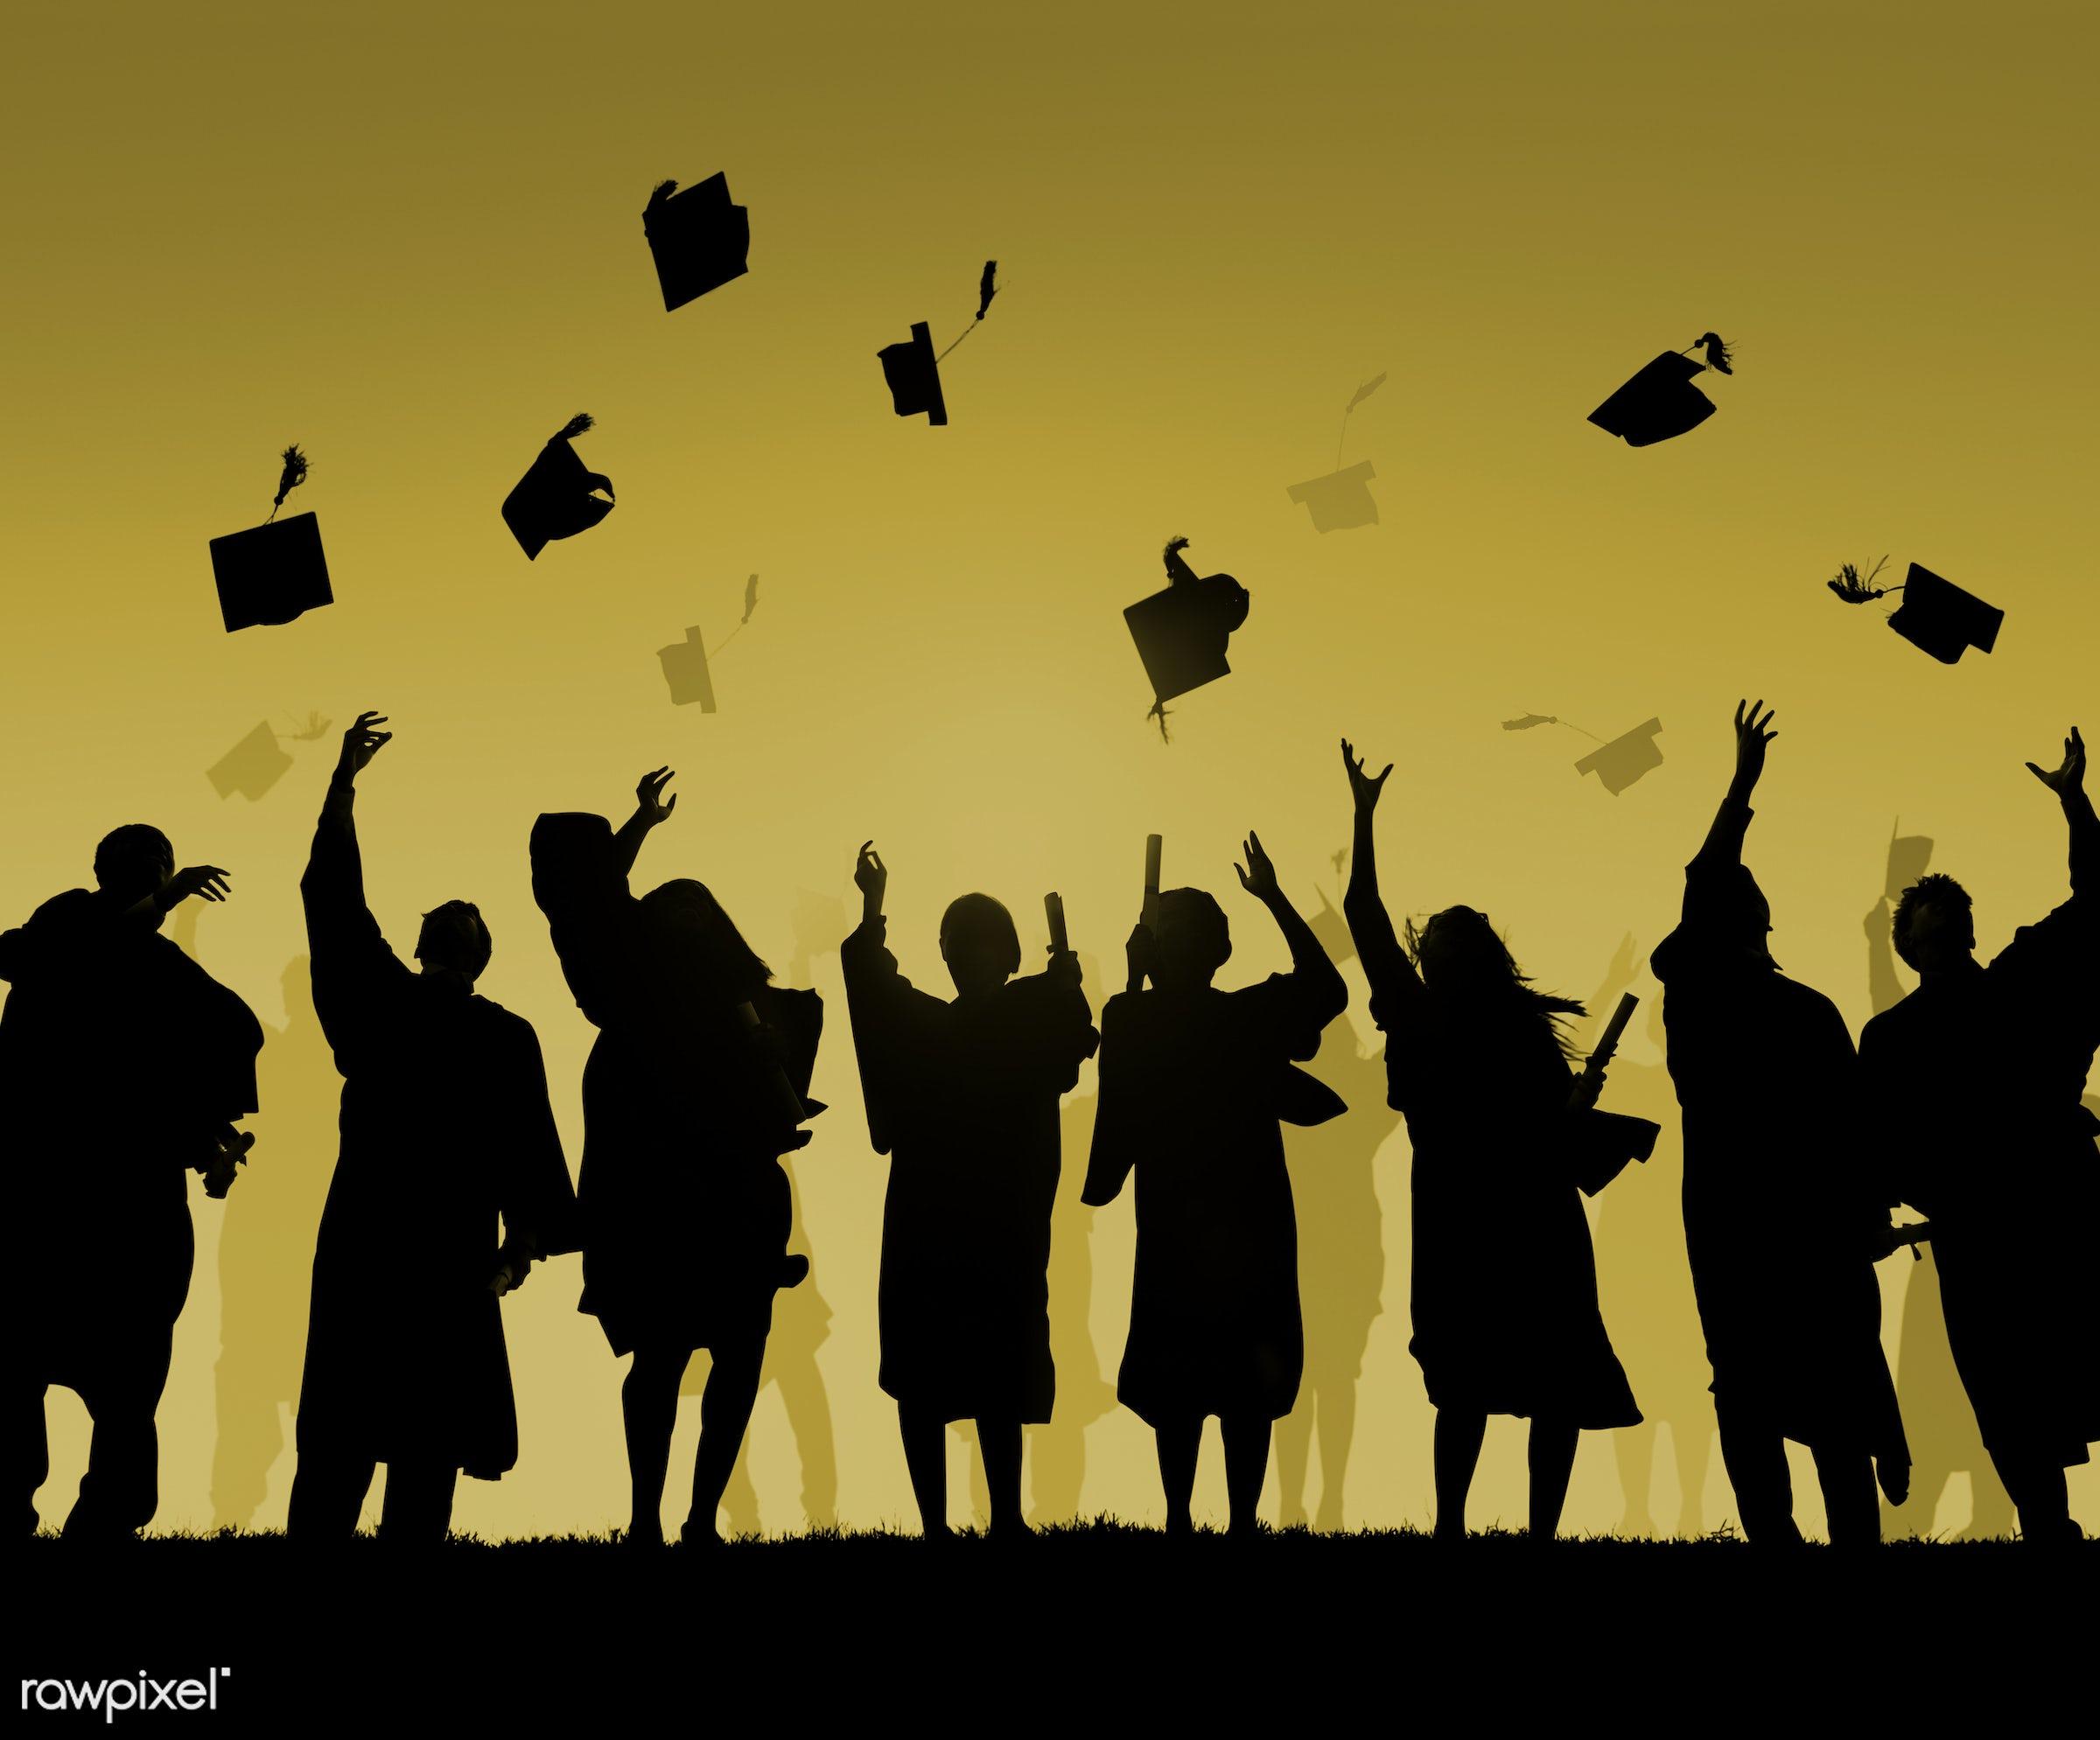 hat, academic, achievement, african descent, black, campus, cap, celebration, ceremony, certificate, cheerful, college,...